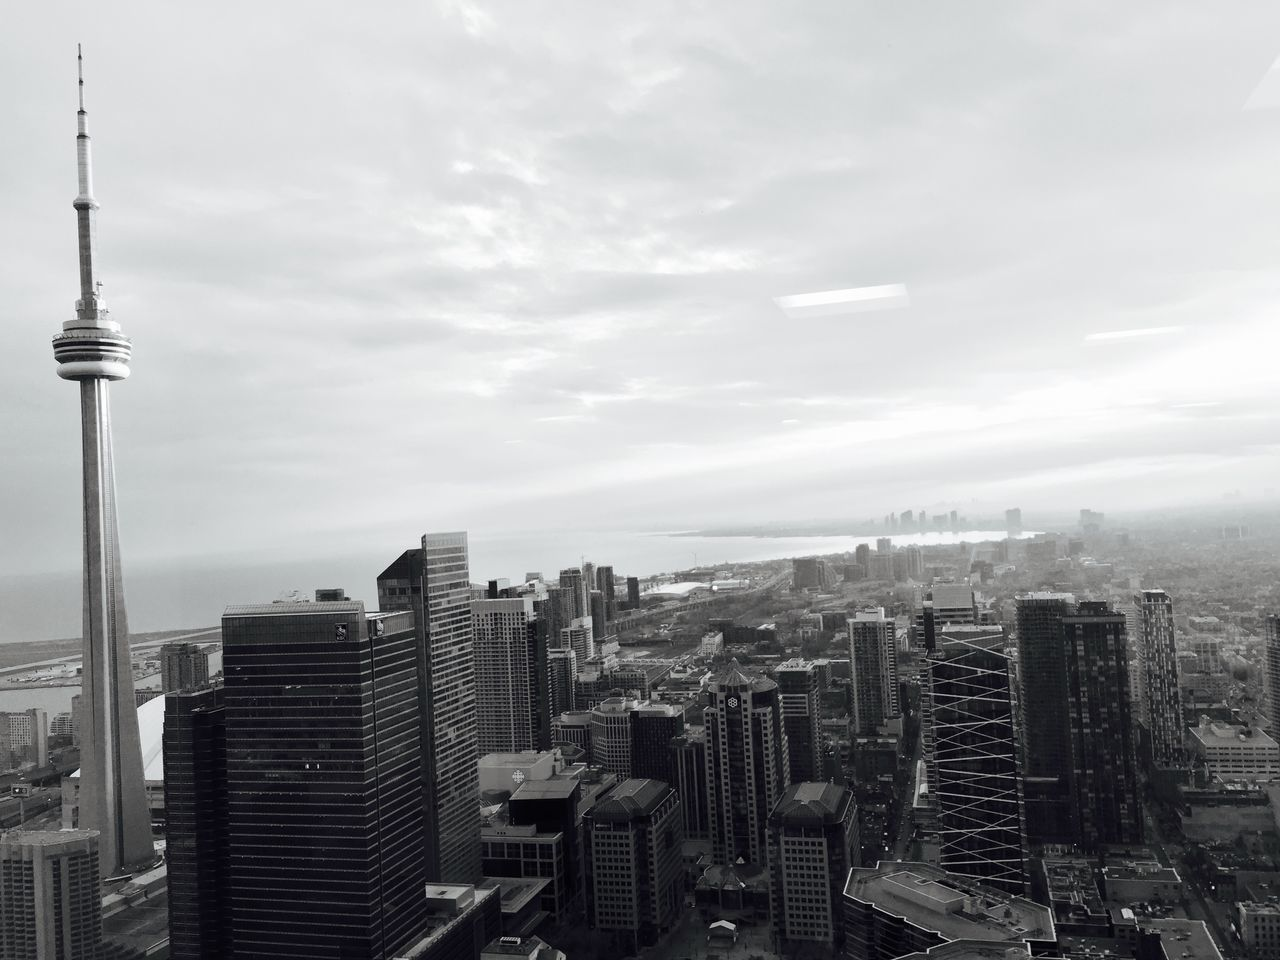 Monochrome Photography 6ix Architecture Water City Toronto No People